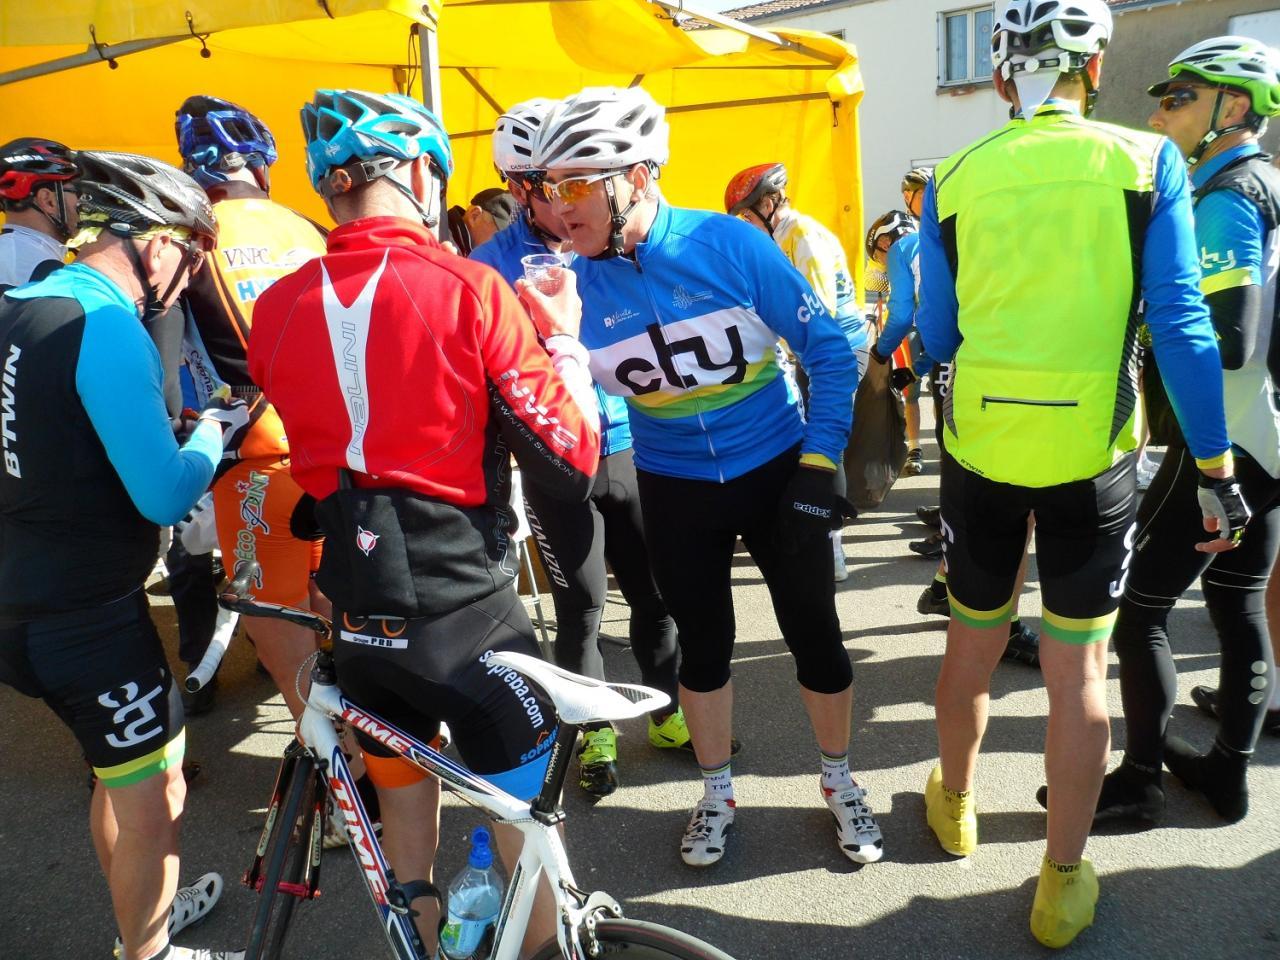 20170423_Ravitaillement Cyclo de Saligny_68